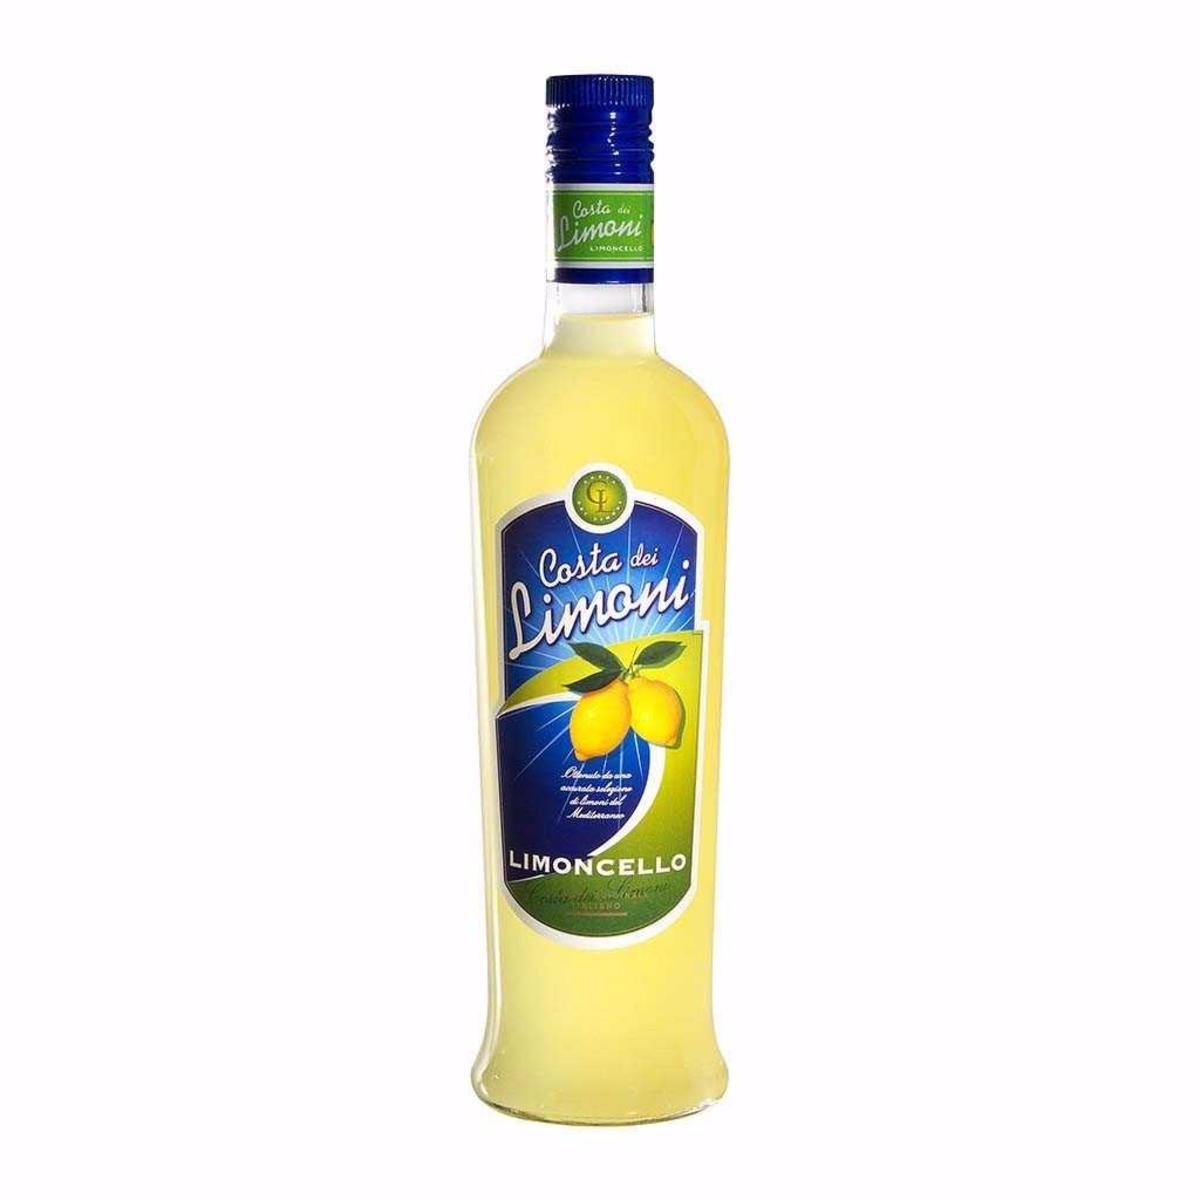 Licor Limoncello Costa dei Limoni 30% 700ml